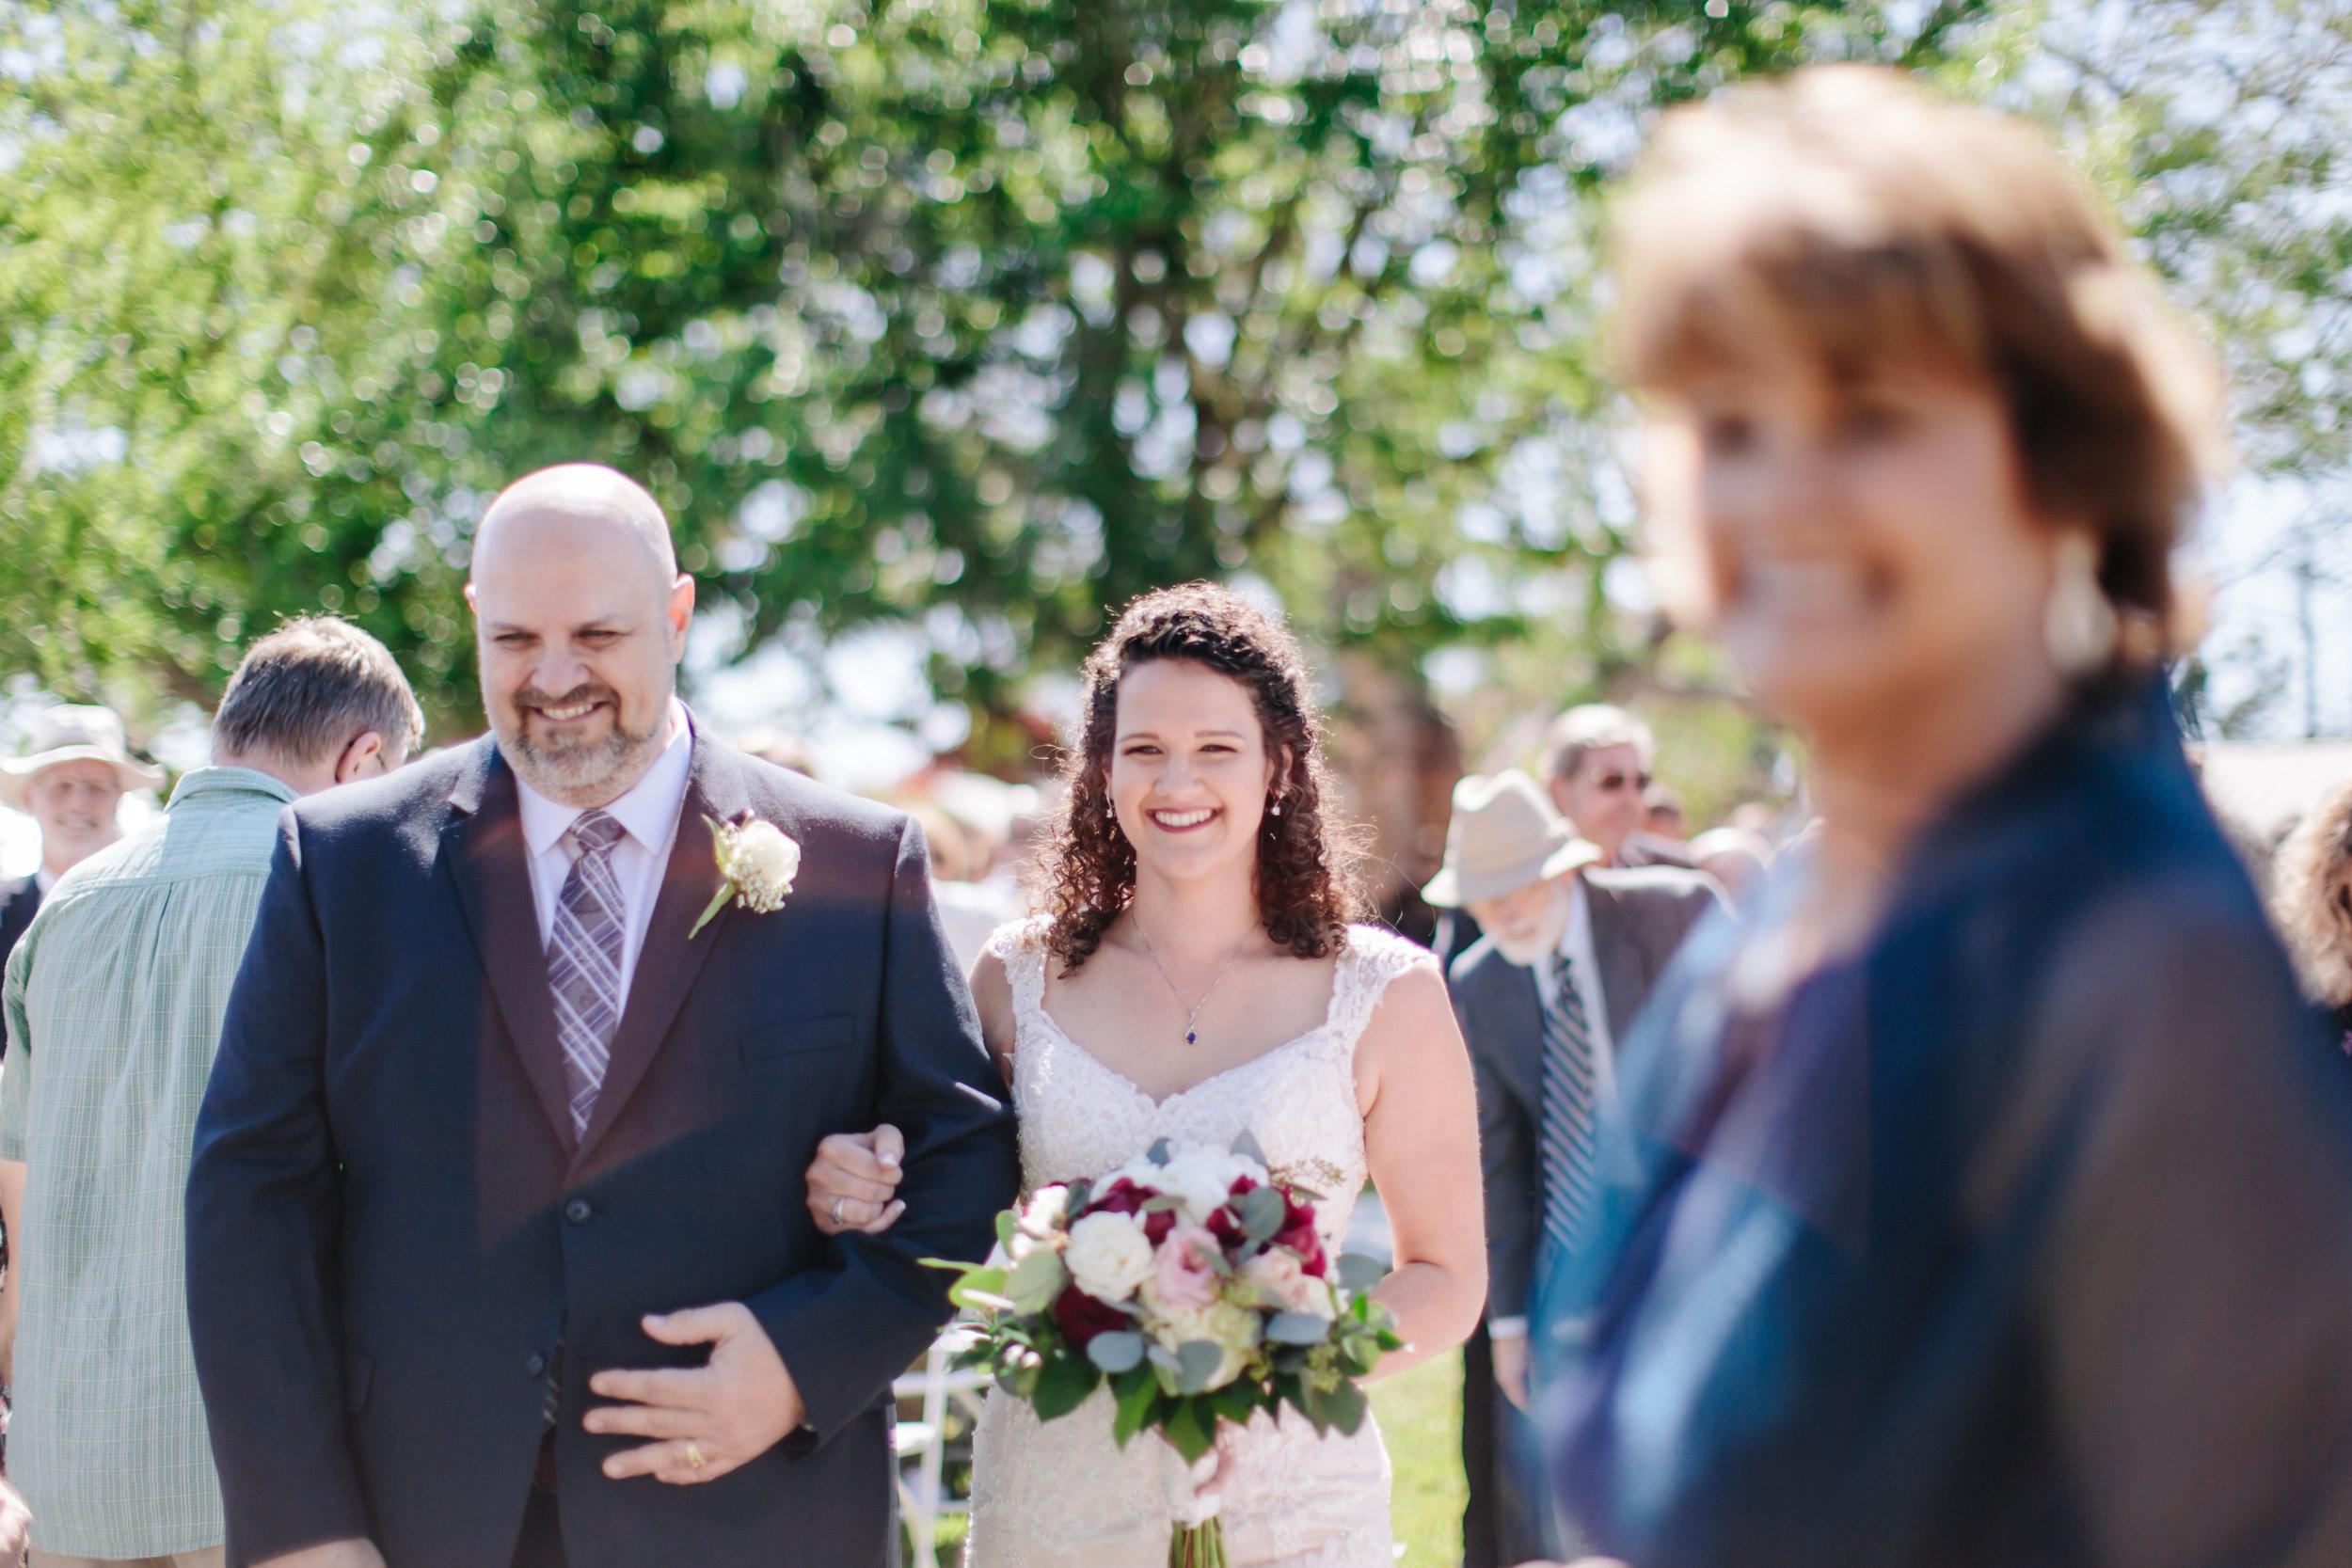 2018.03.17 Allison and Chuck Wedding Waelti Melbourne (244 of 900).jpg